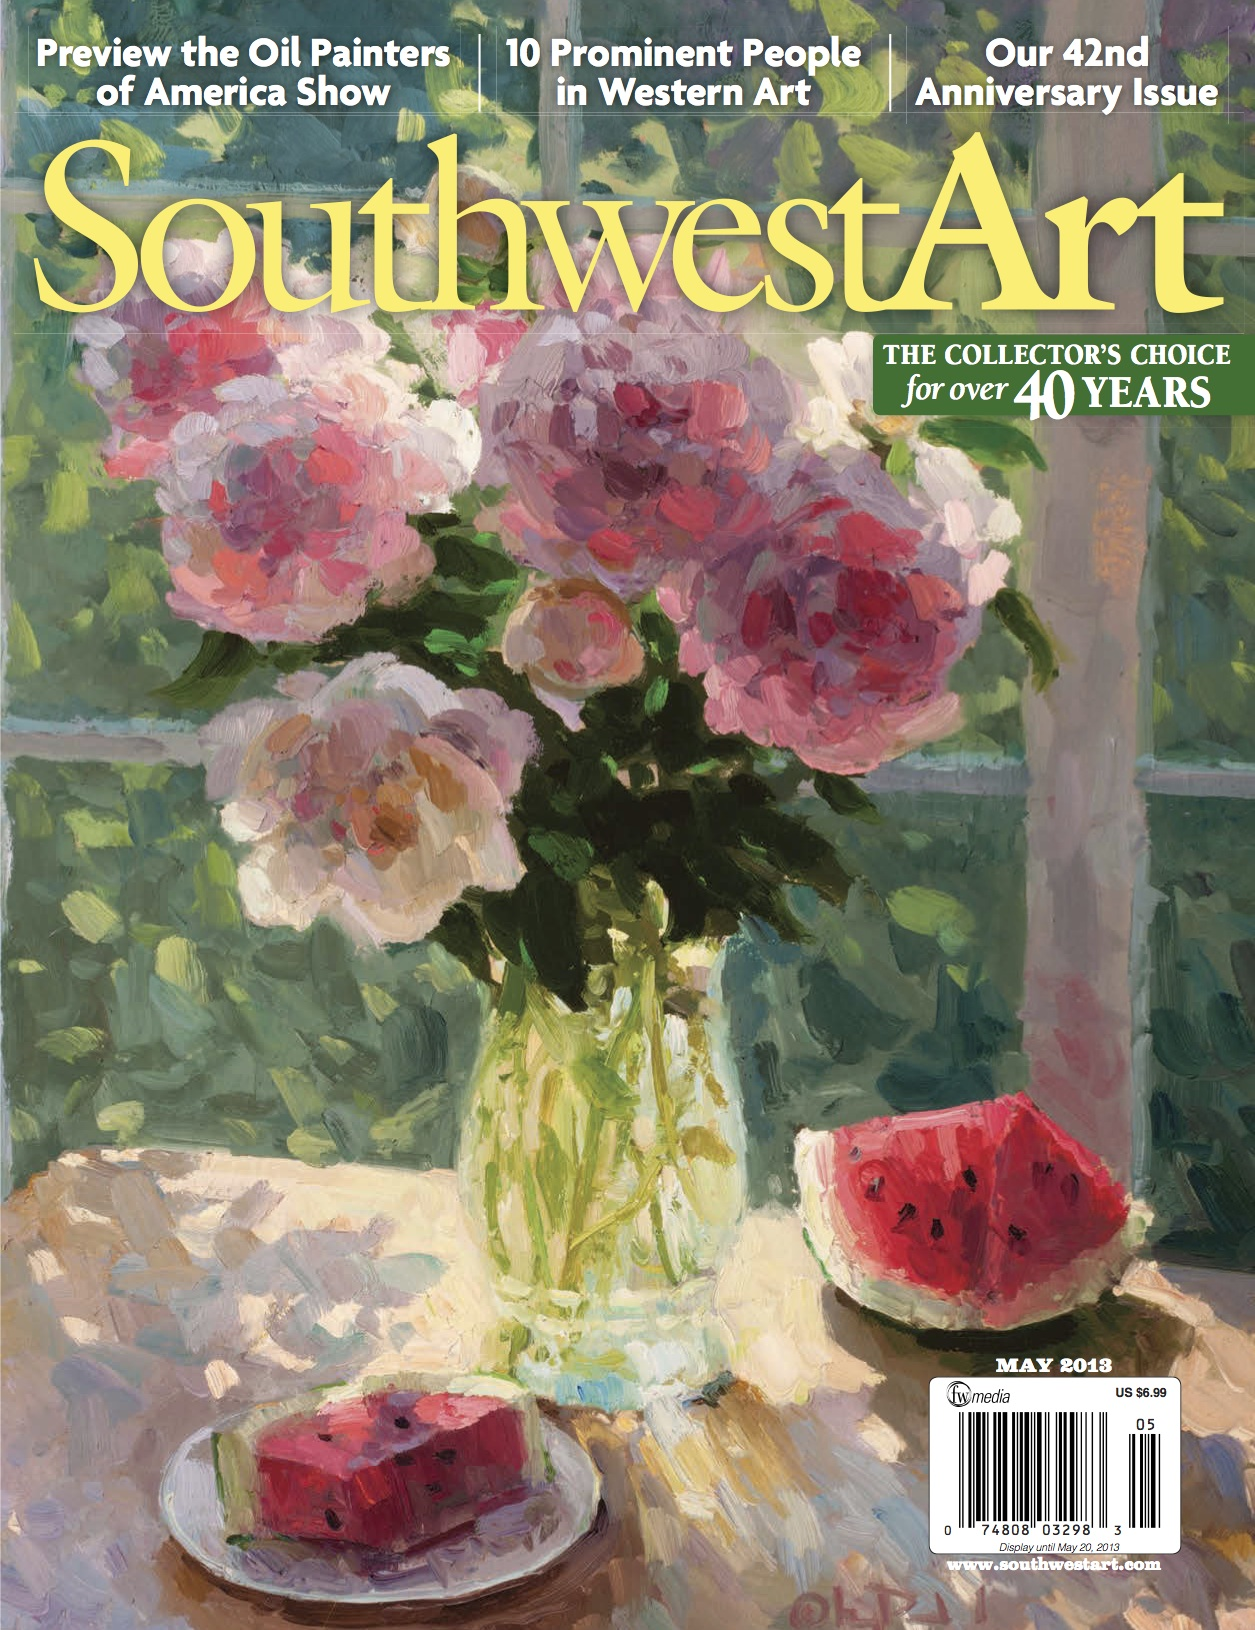 Southwest Art Magazine May 2013 (dragged) copy